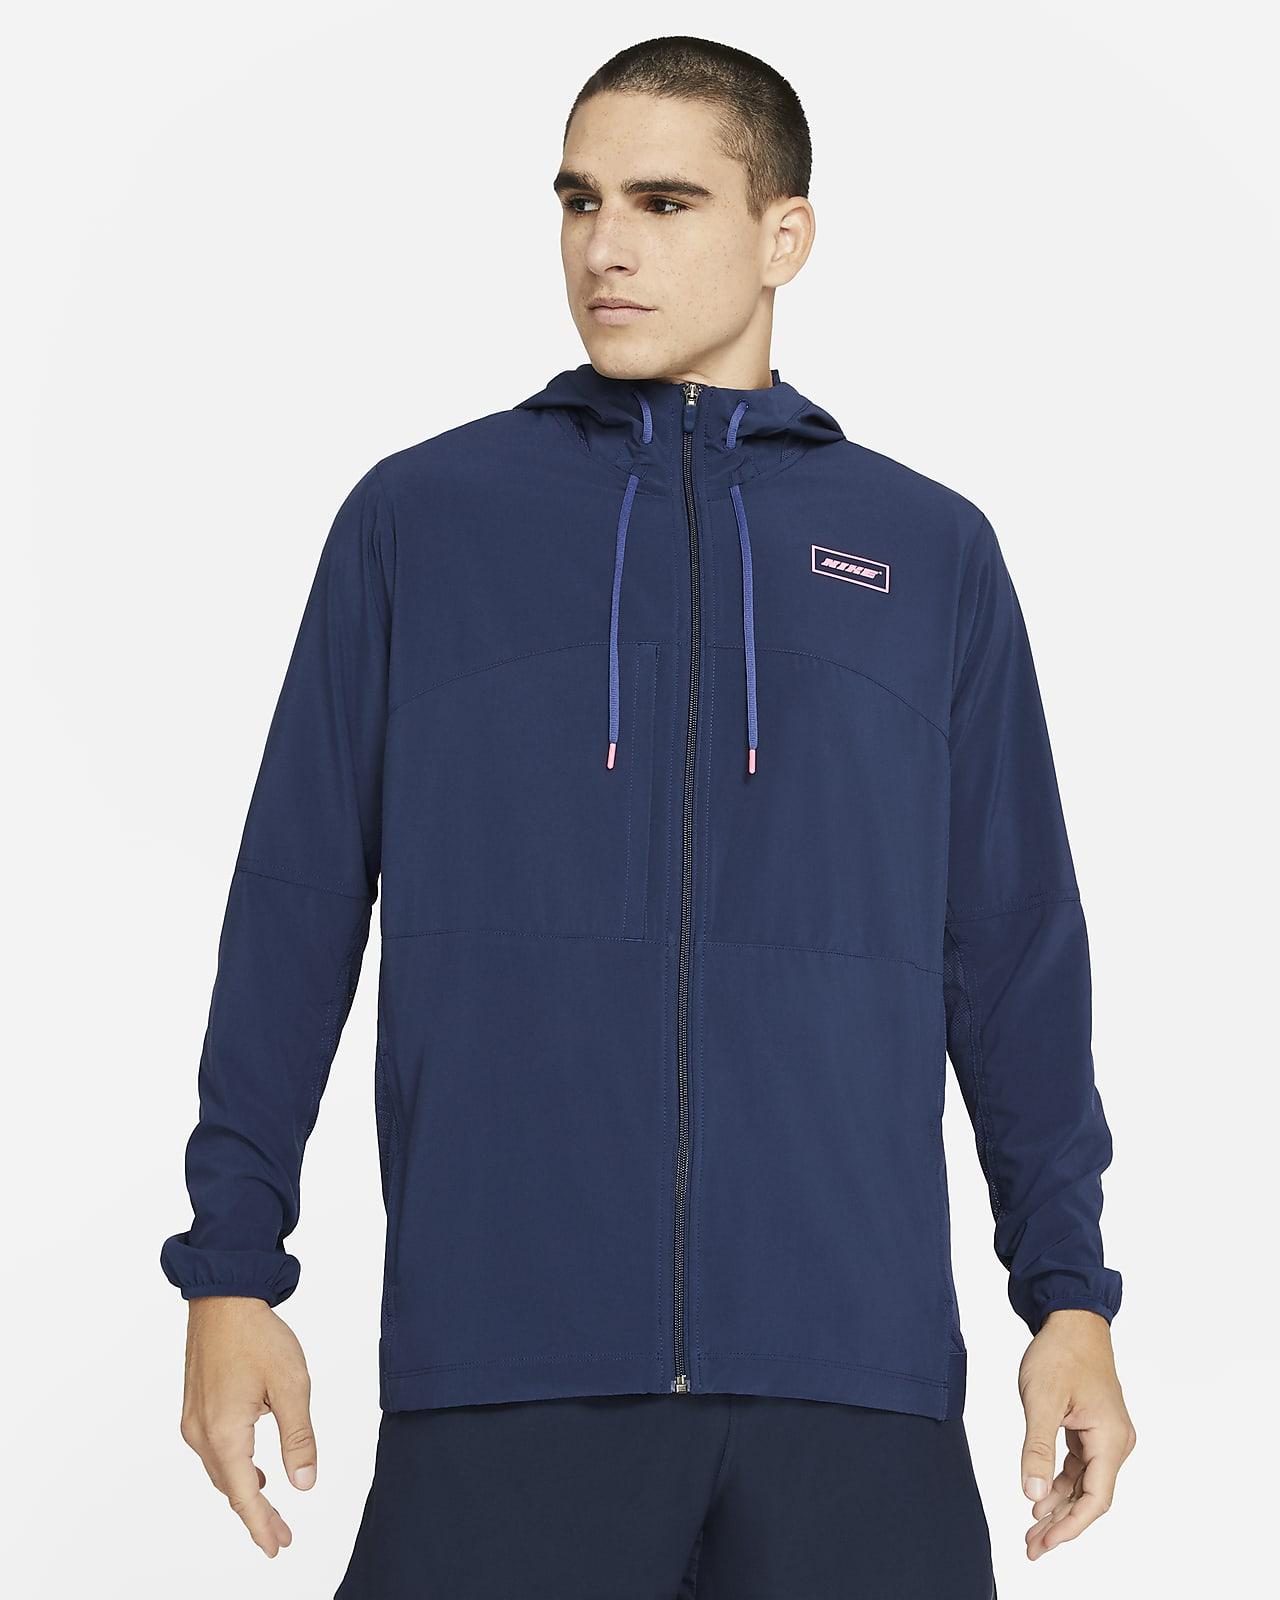 Nike Sport Clash Men's Full-Zip Training Jacket